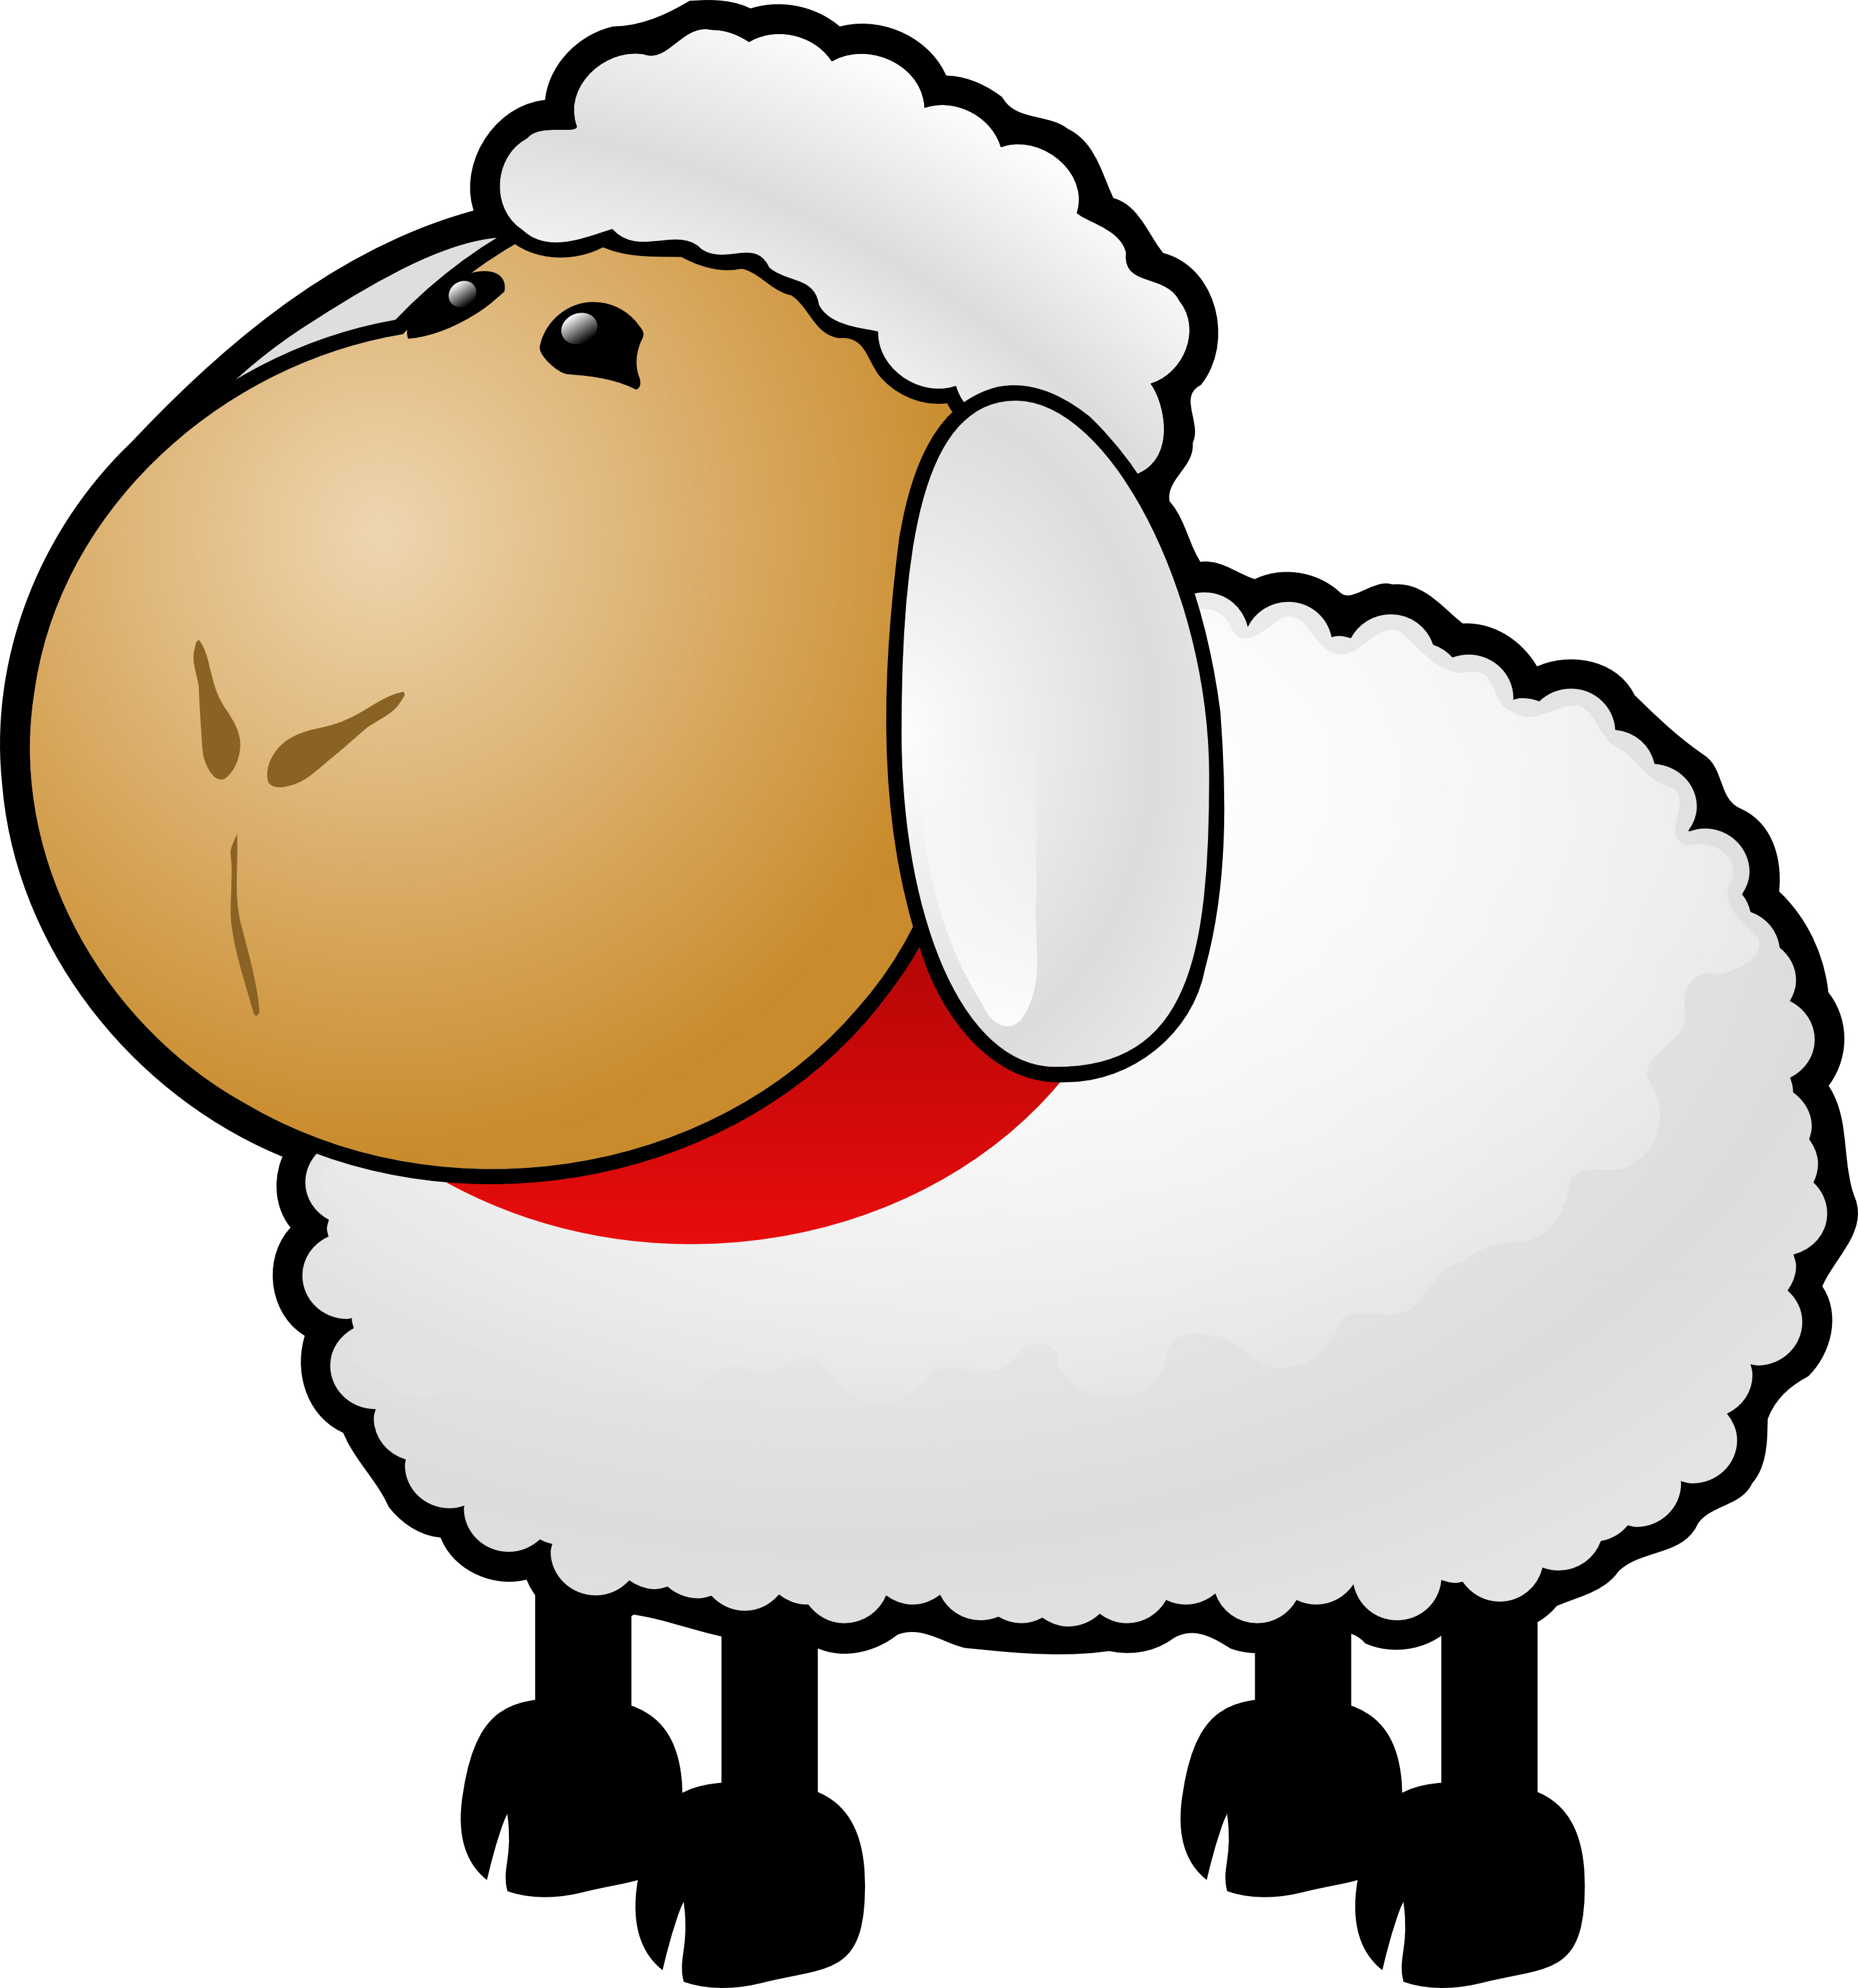 Free Cartoon Sheep Clipart Illustration -Free Cartoon Sheep Clipart Illustration by 000154 .-4